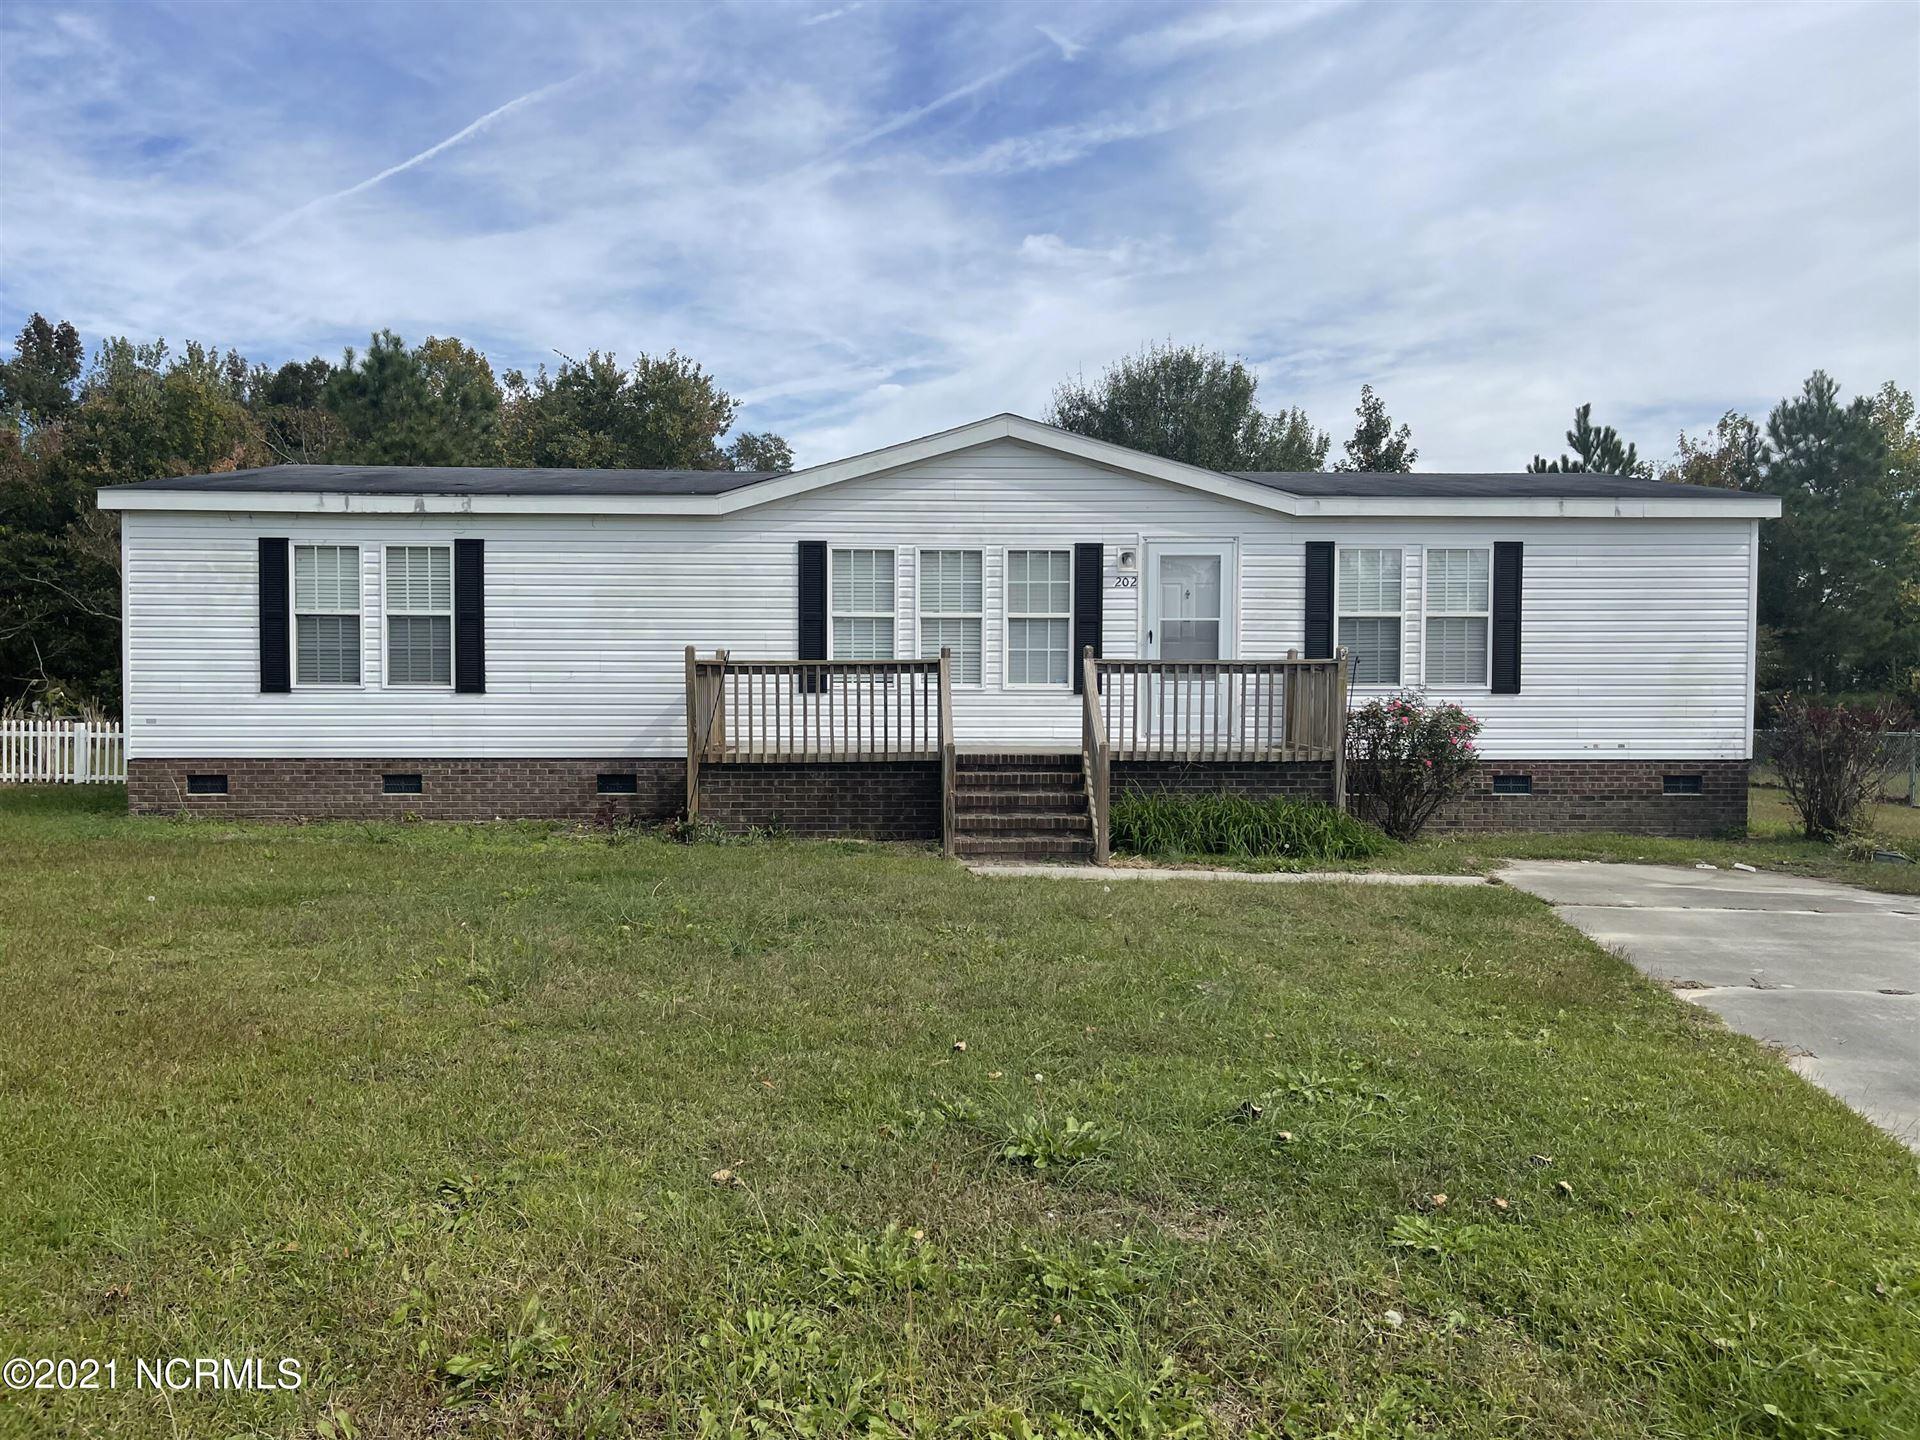 Photo of 202 Bert Court, Richlands, NC 28574 (MLS # 100295336)